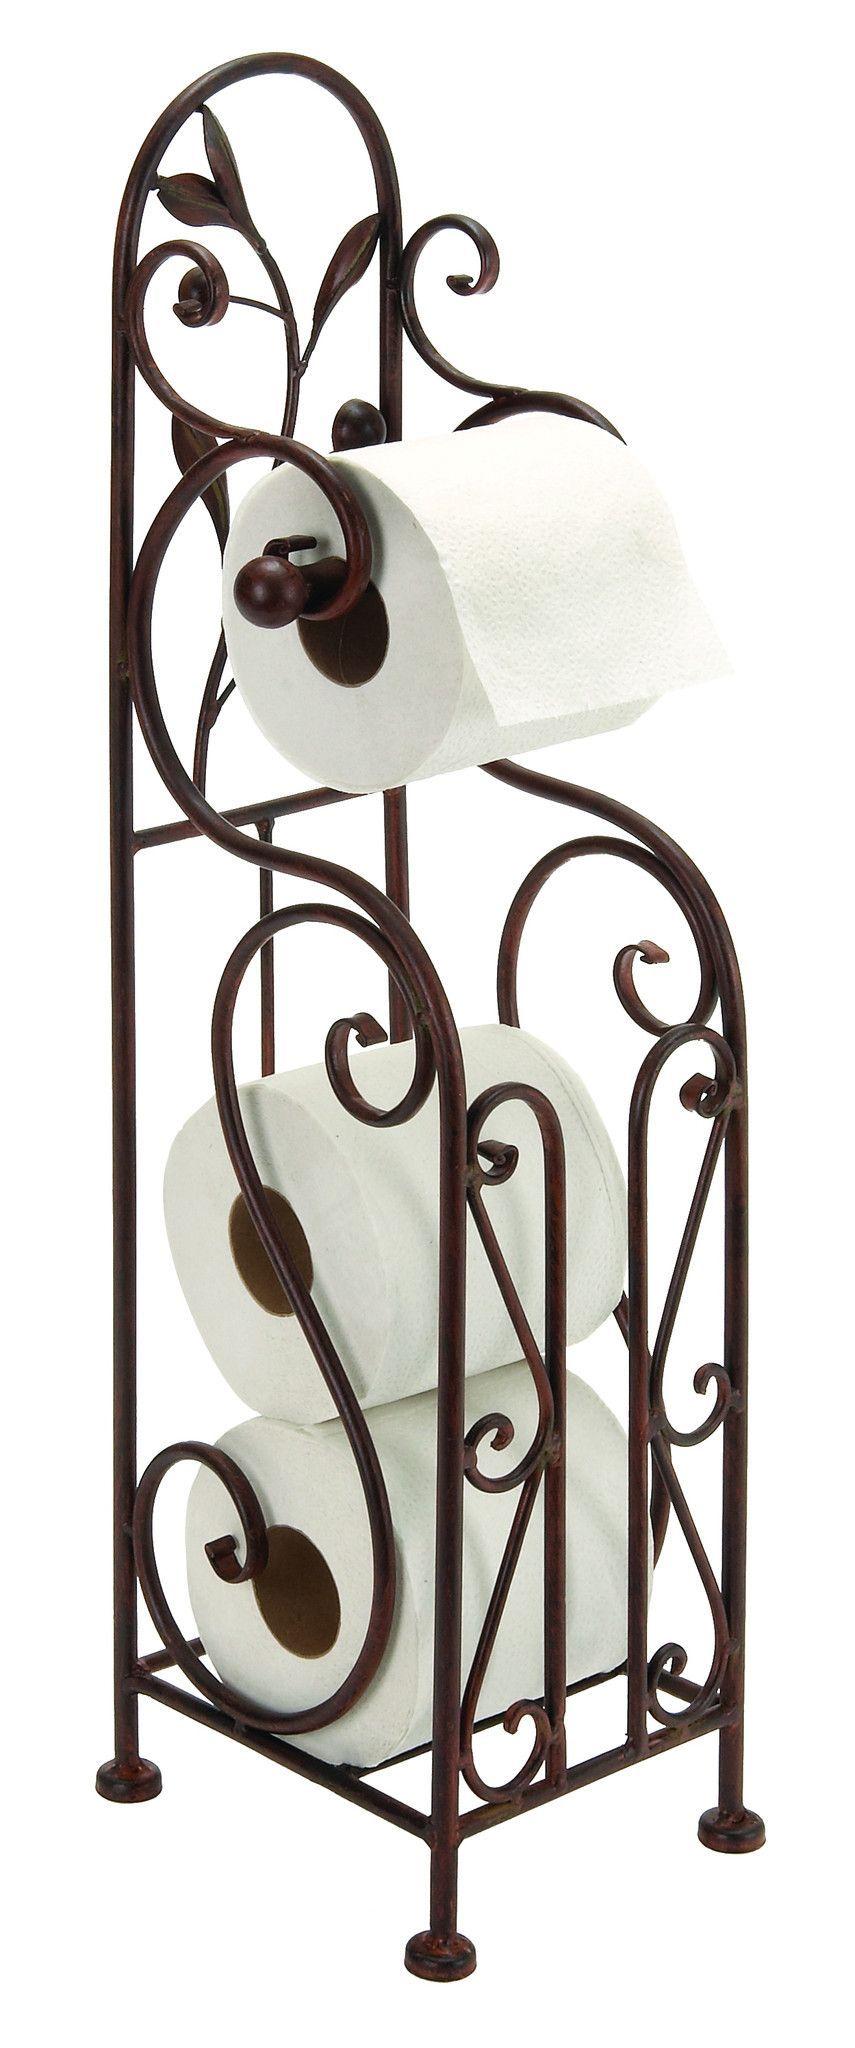 Metal Toilet Paper Holder For Bathroom ? Toilet Furnishing